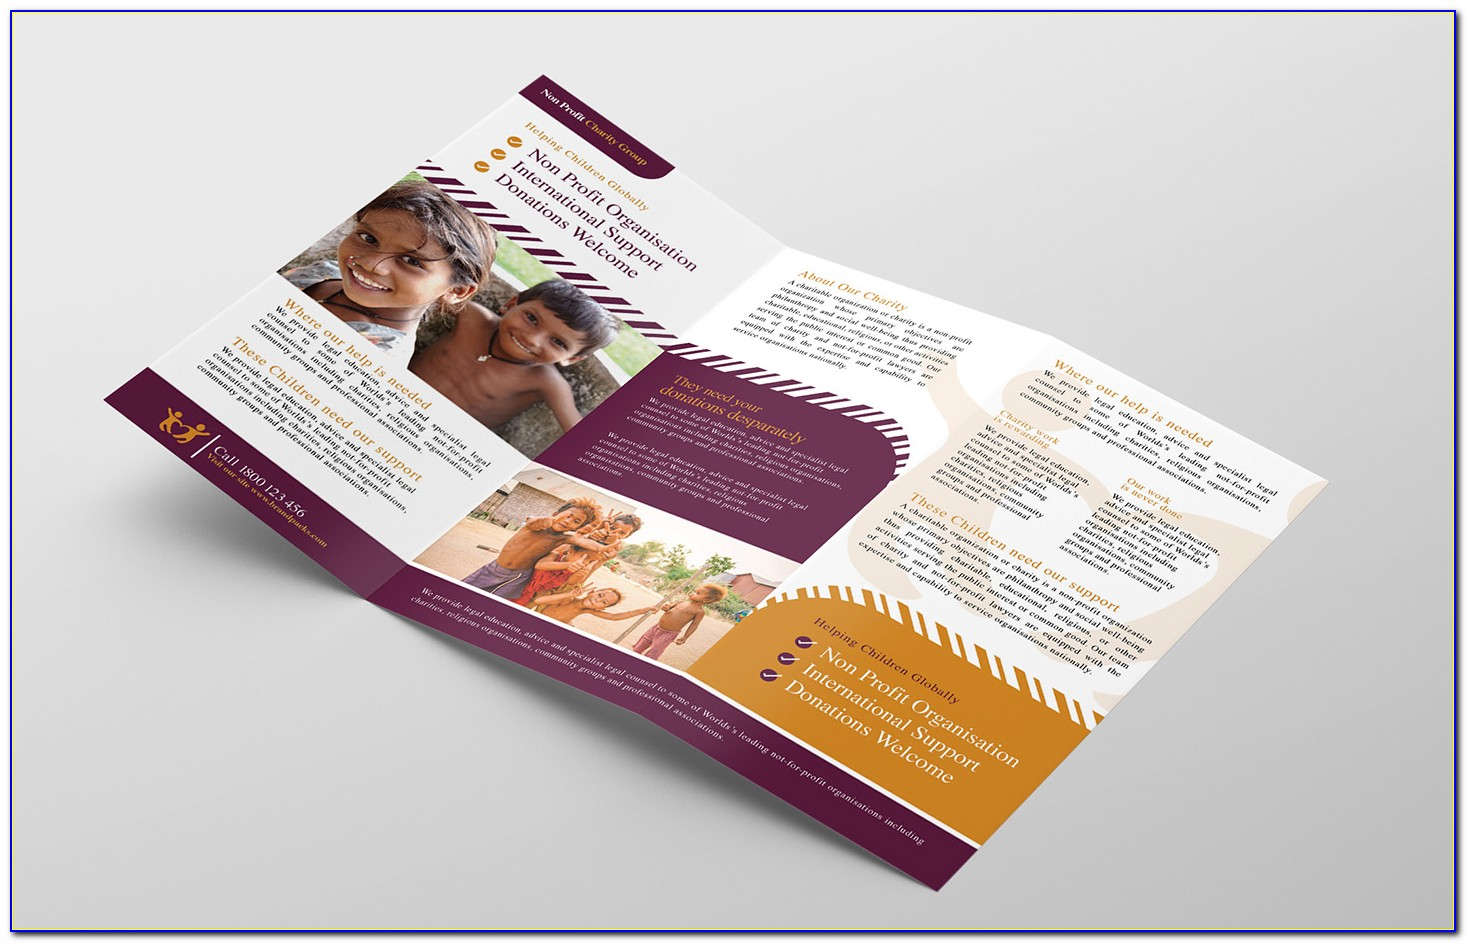 Oce Plotwave 340 Brochure